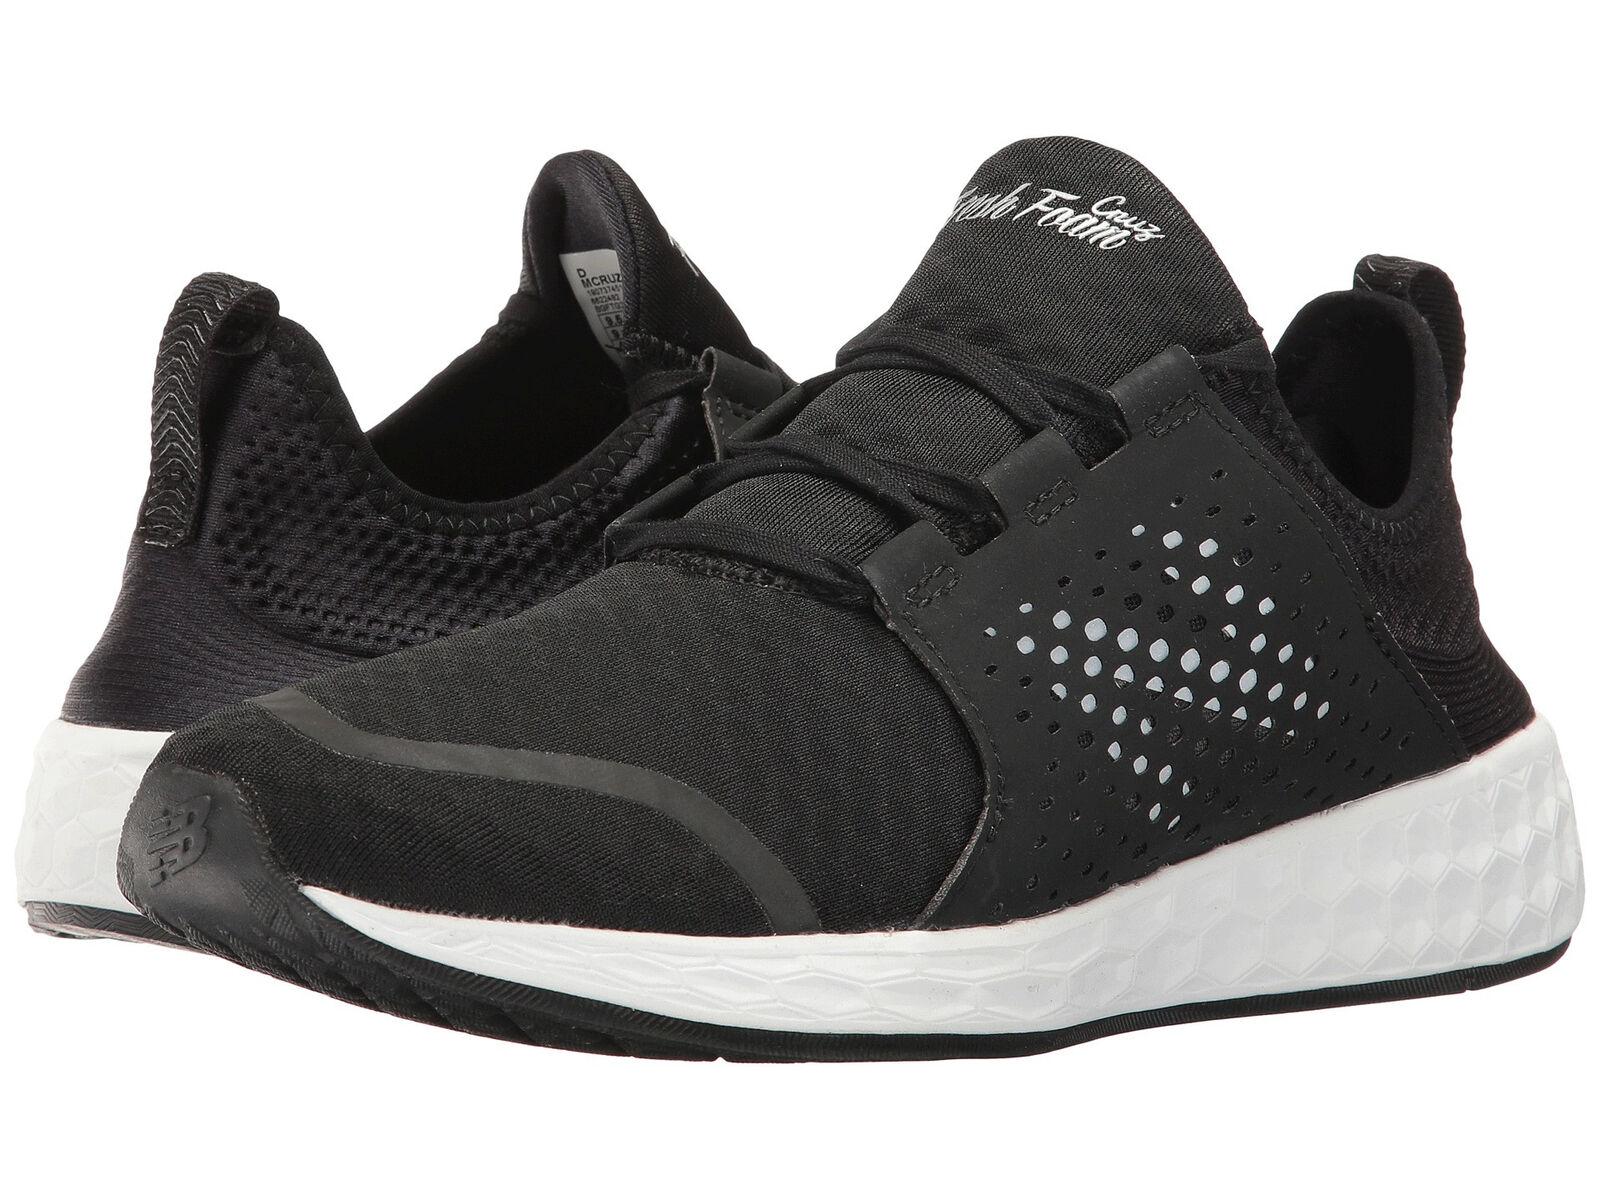 New Balance Men's Fashion Sneakers Fresh Foam Cruz Black White MCRUZBK